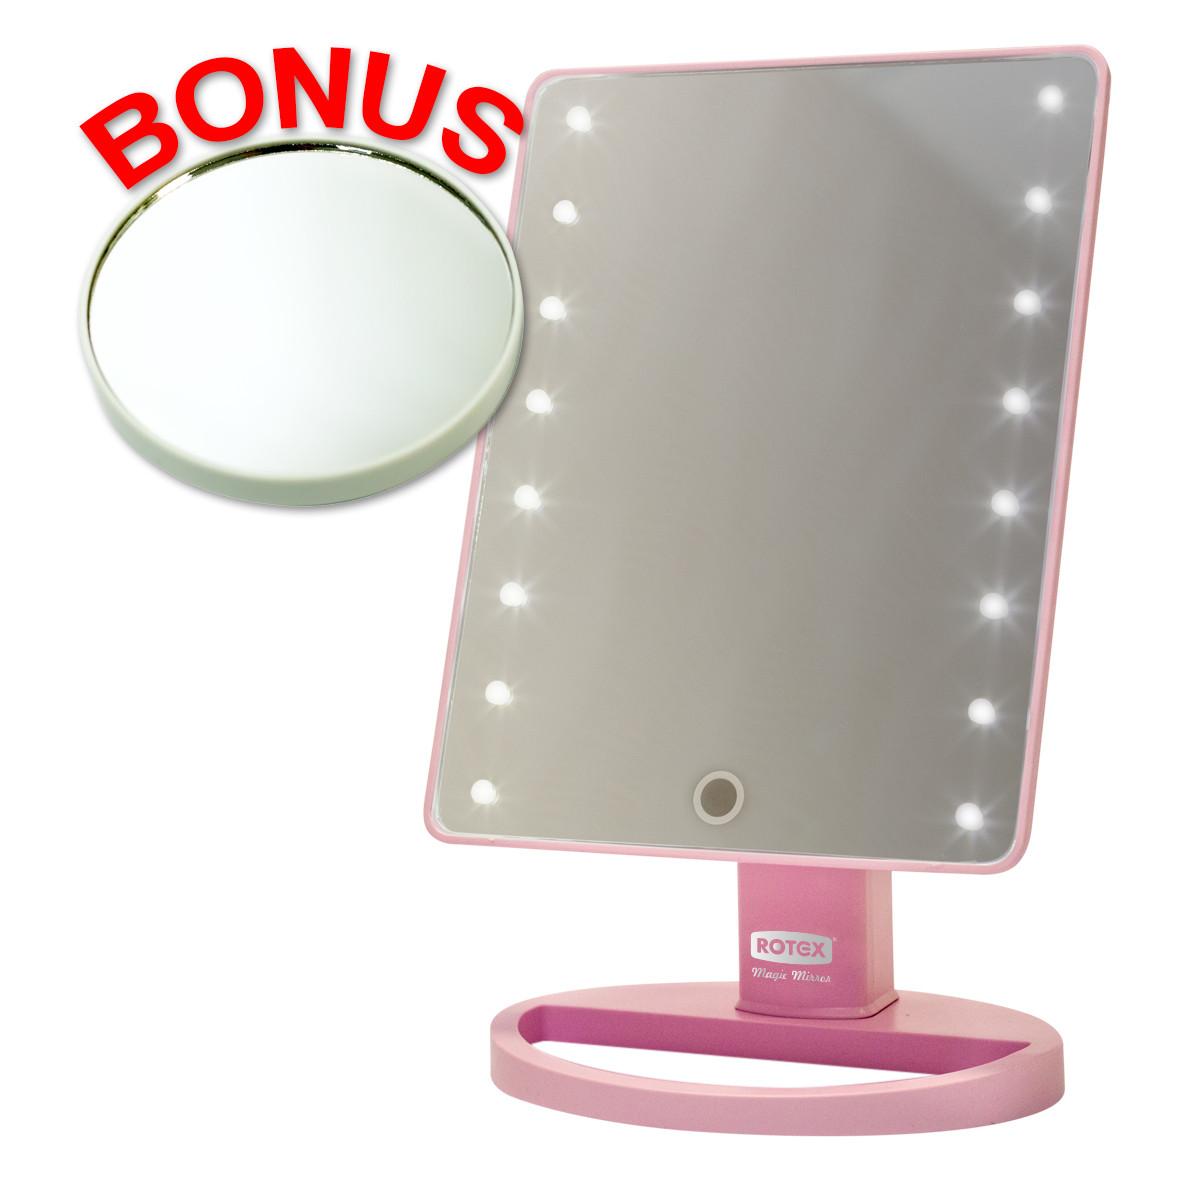 Зеркало для макияжа Rotex RHC25-P Magic Mirror с LED-подсветкой